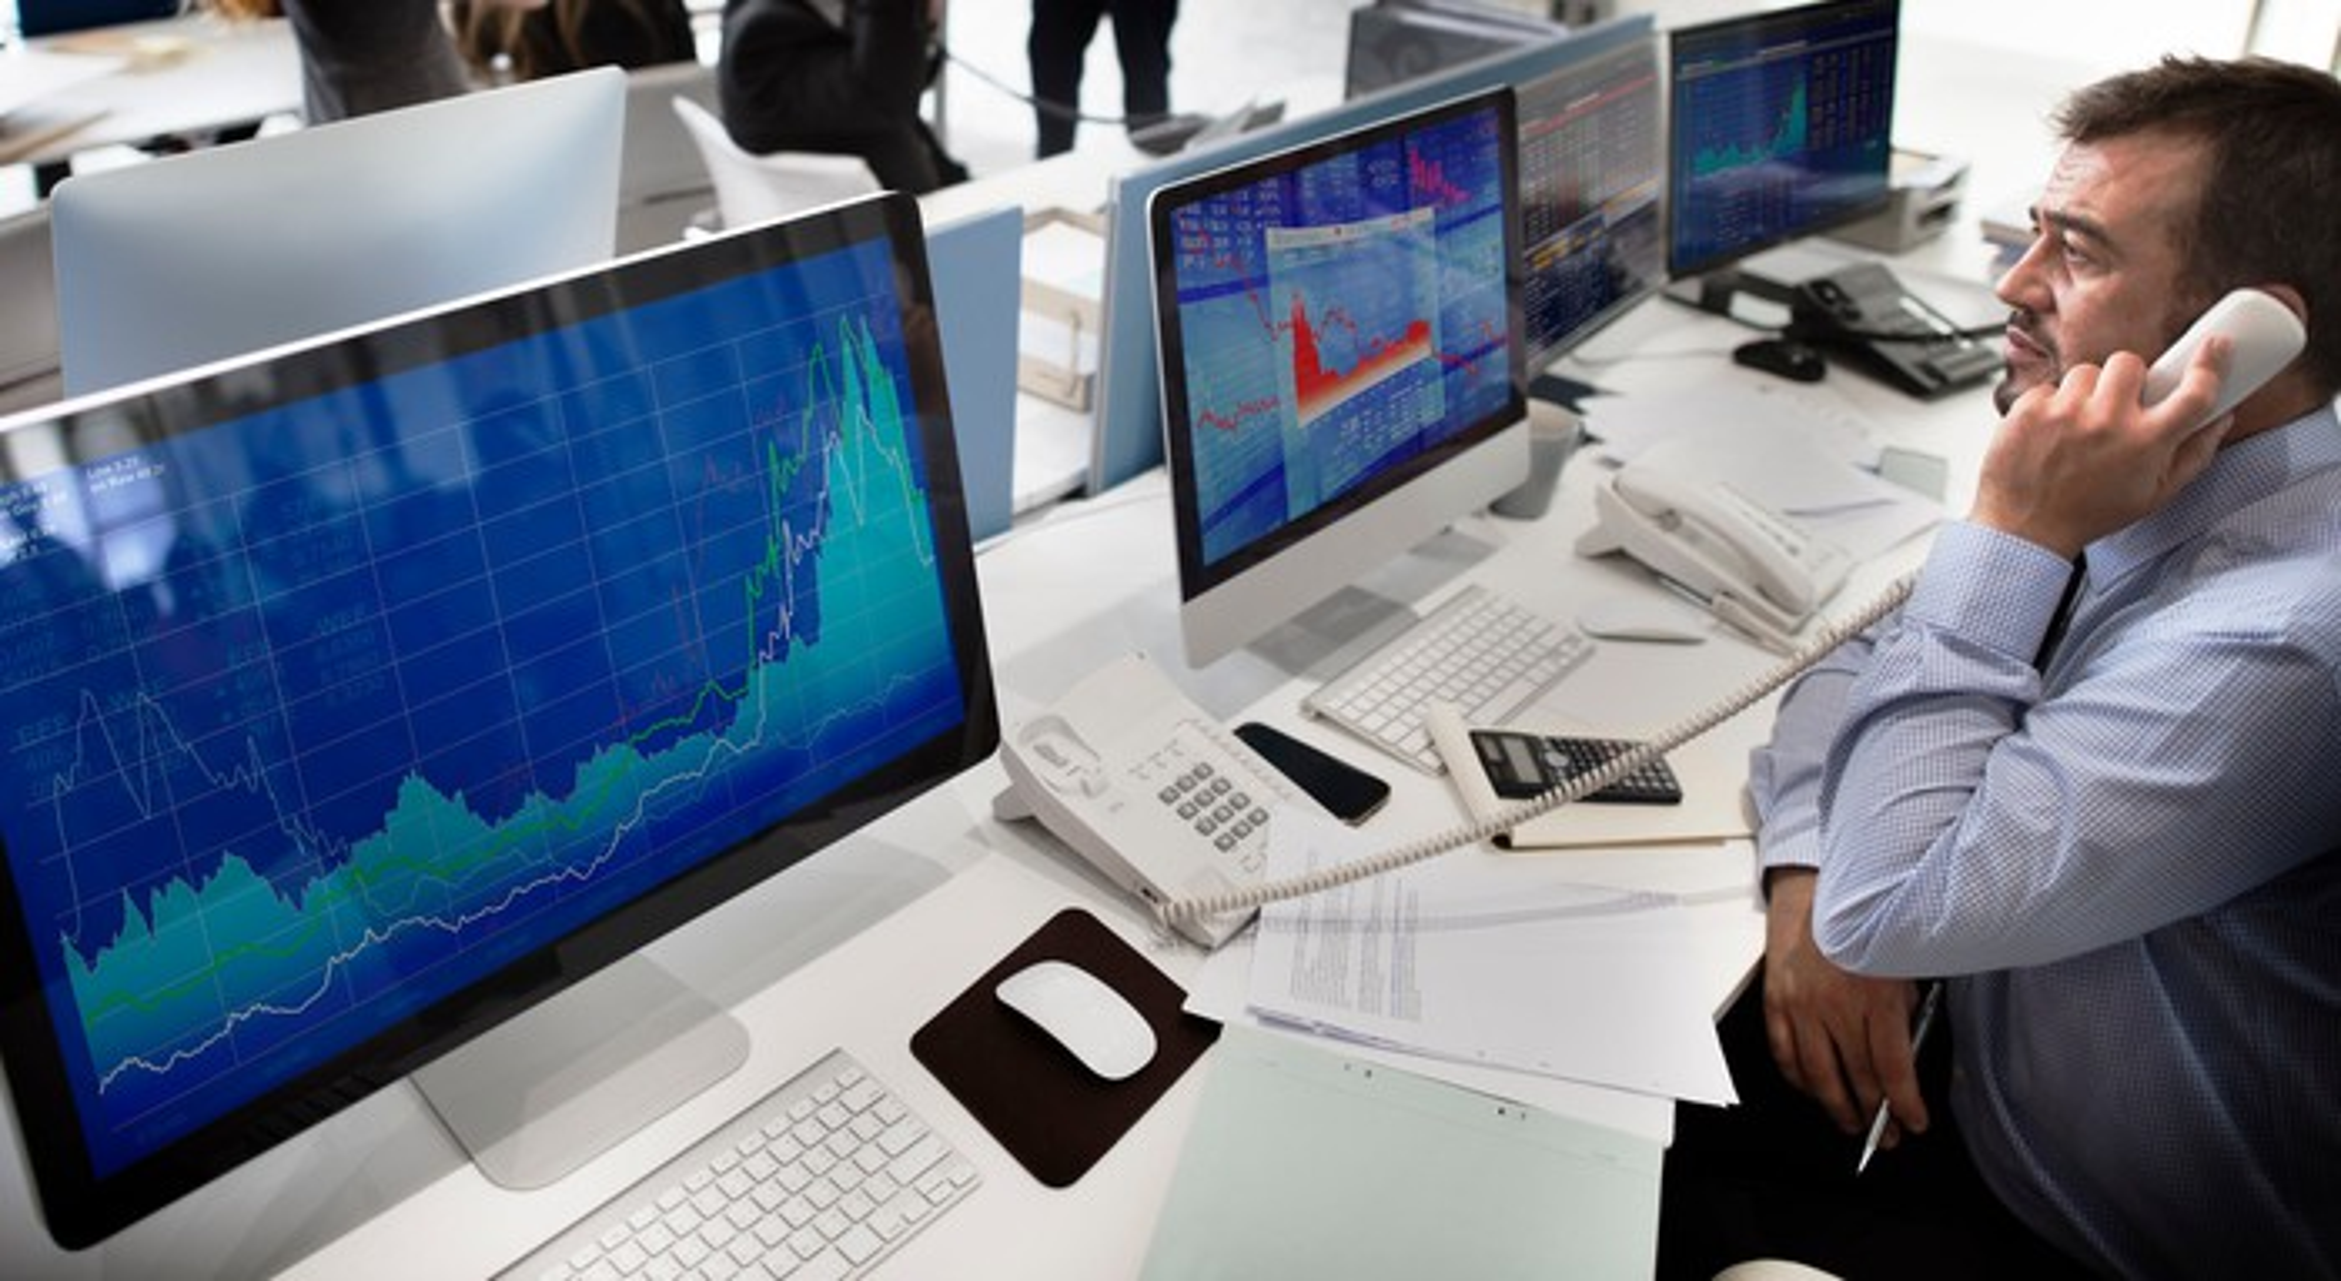 Stock trader on phone examining stock charts.